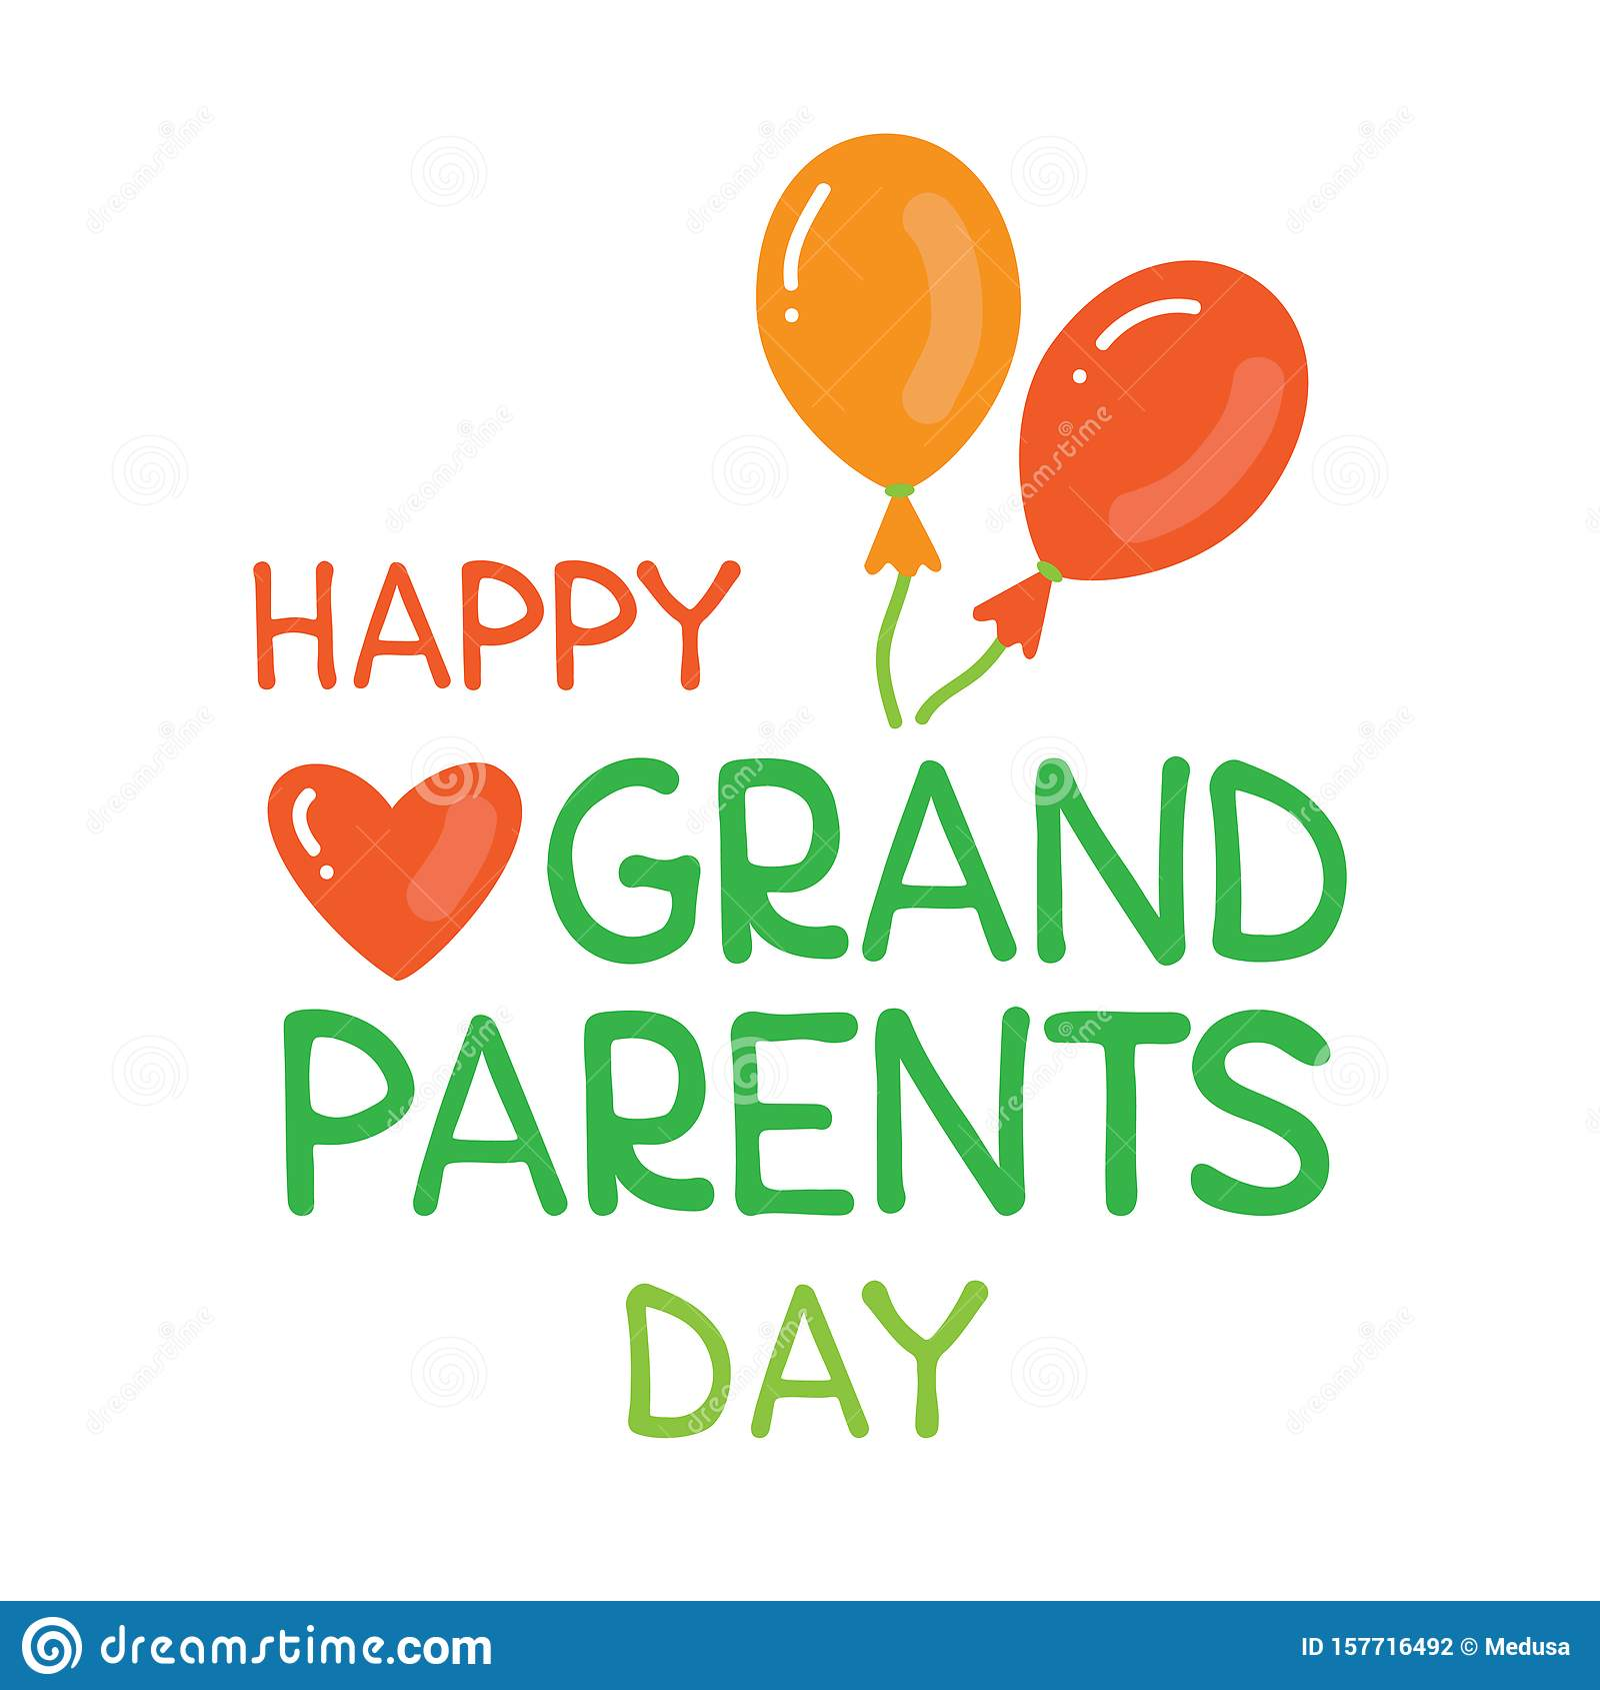 Grandparents day-03